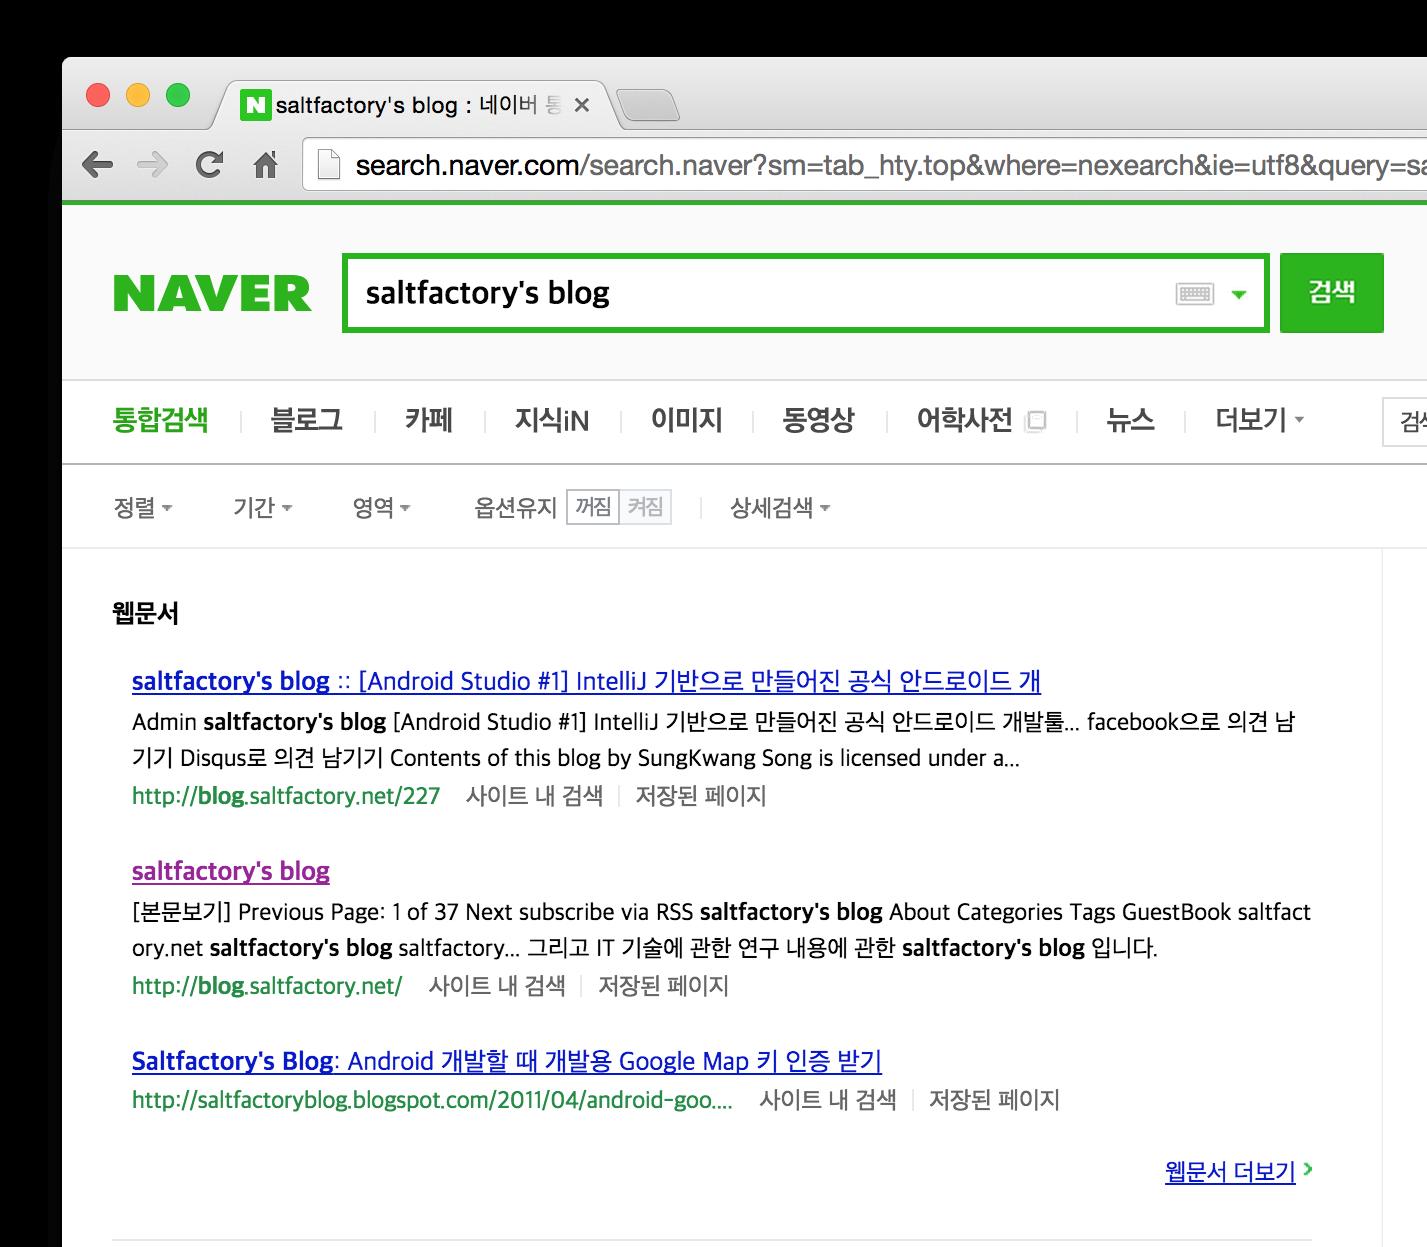 saltfactory's blog 검색결과